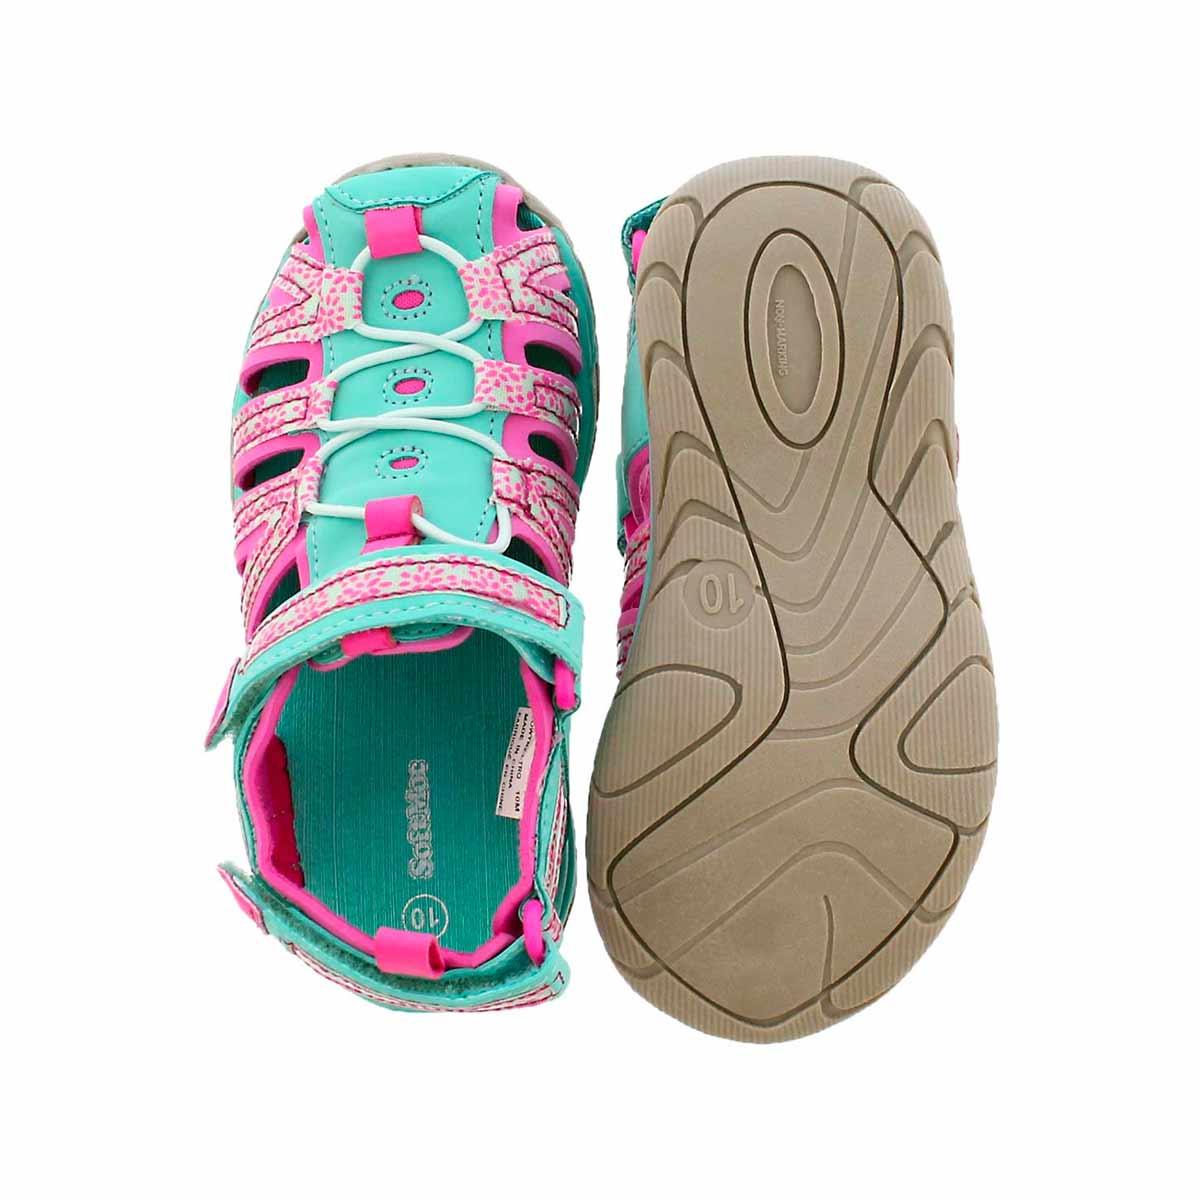 Inf Eowyn 2 turq/pnk closed toe sandal